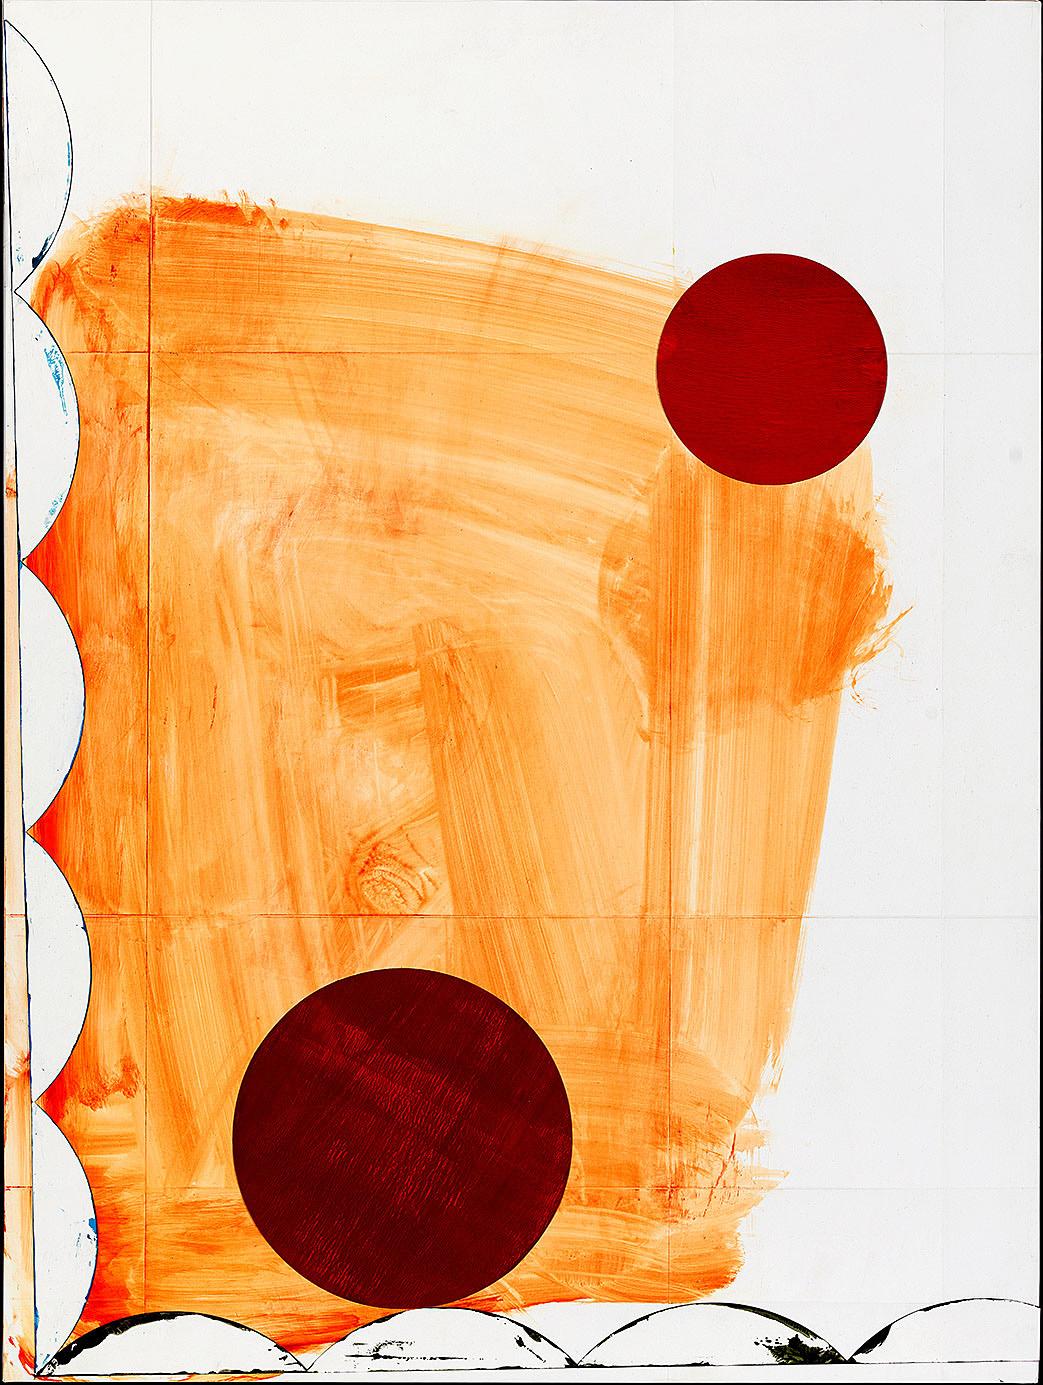 Öl auf Leinwand, 60x40